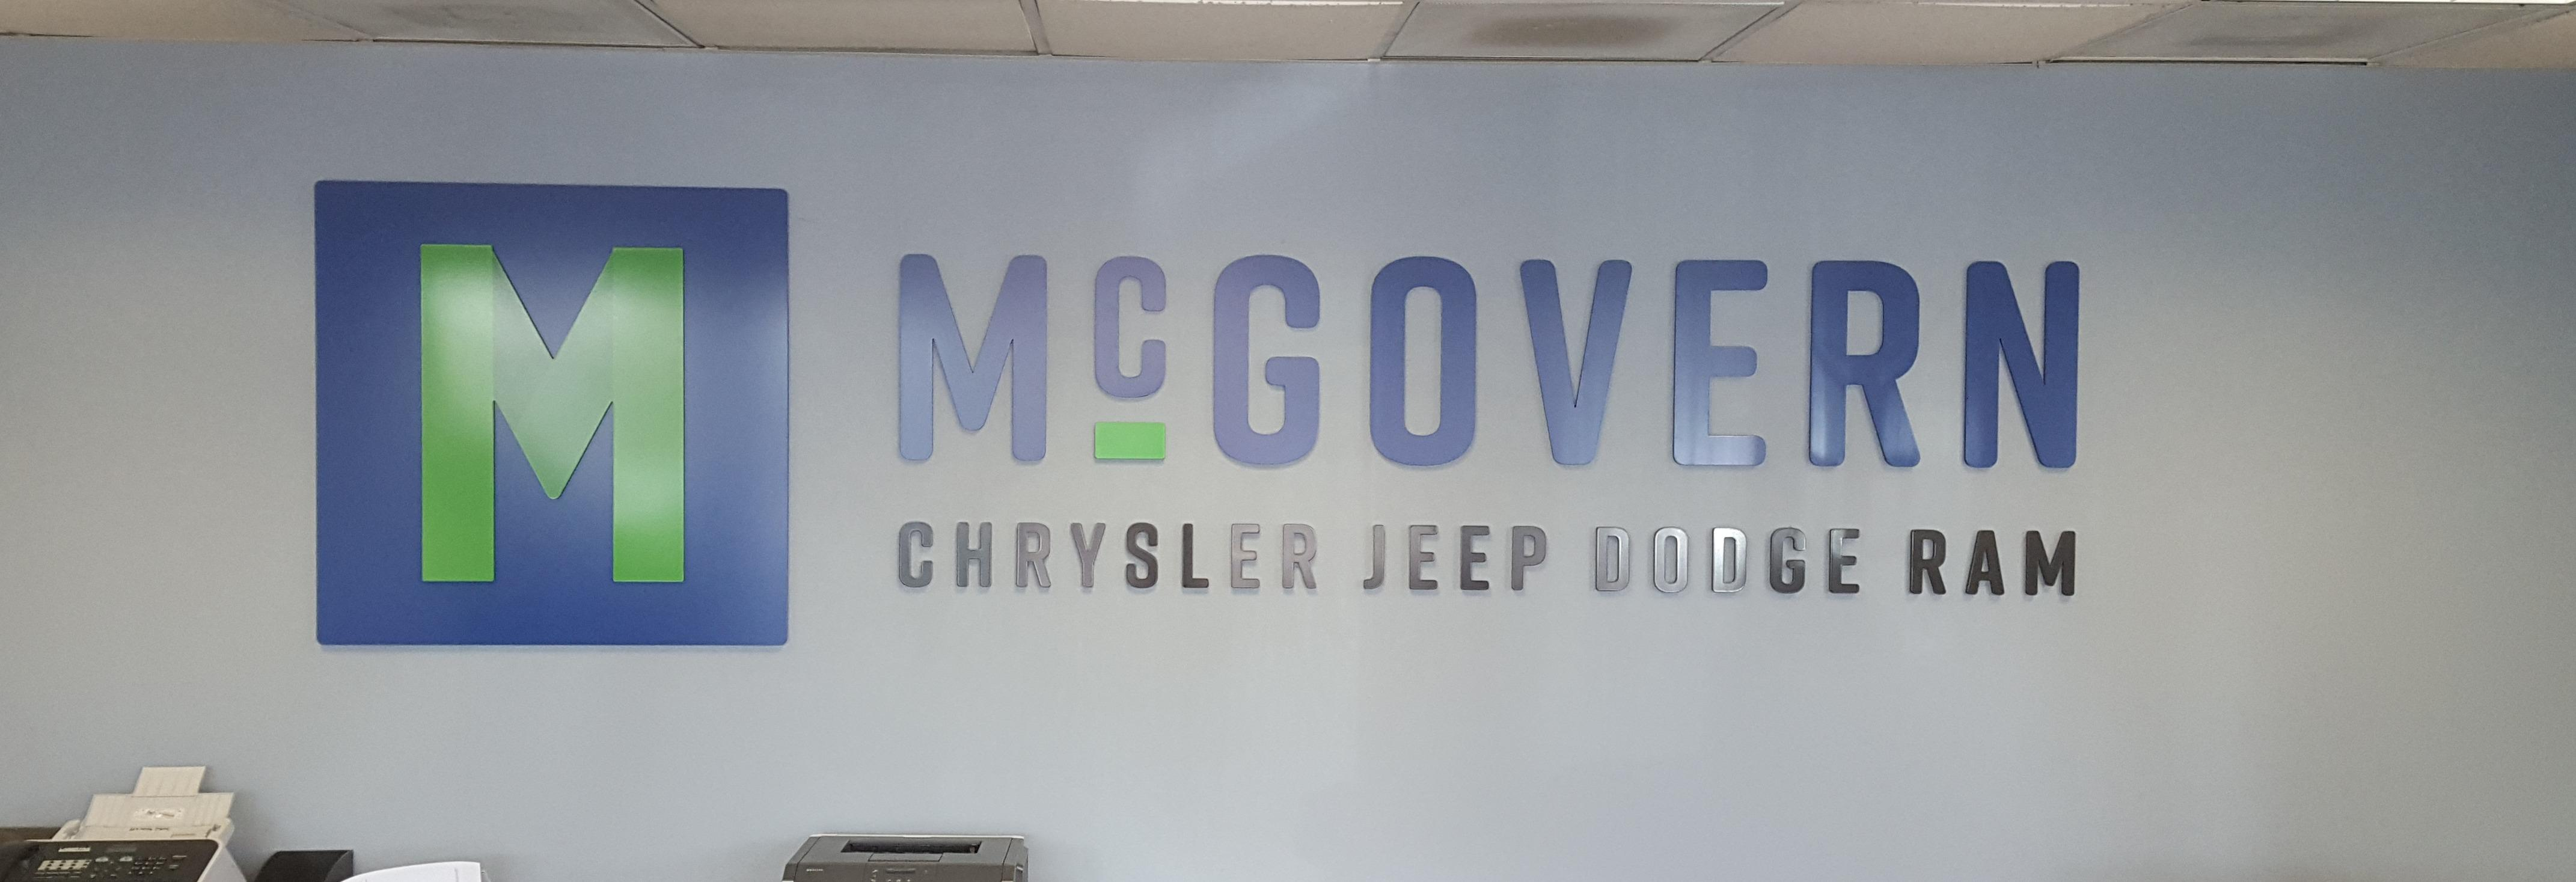 McGovern Chrysler Jeep Dodge Ram image 6